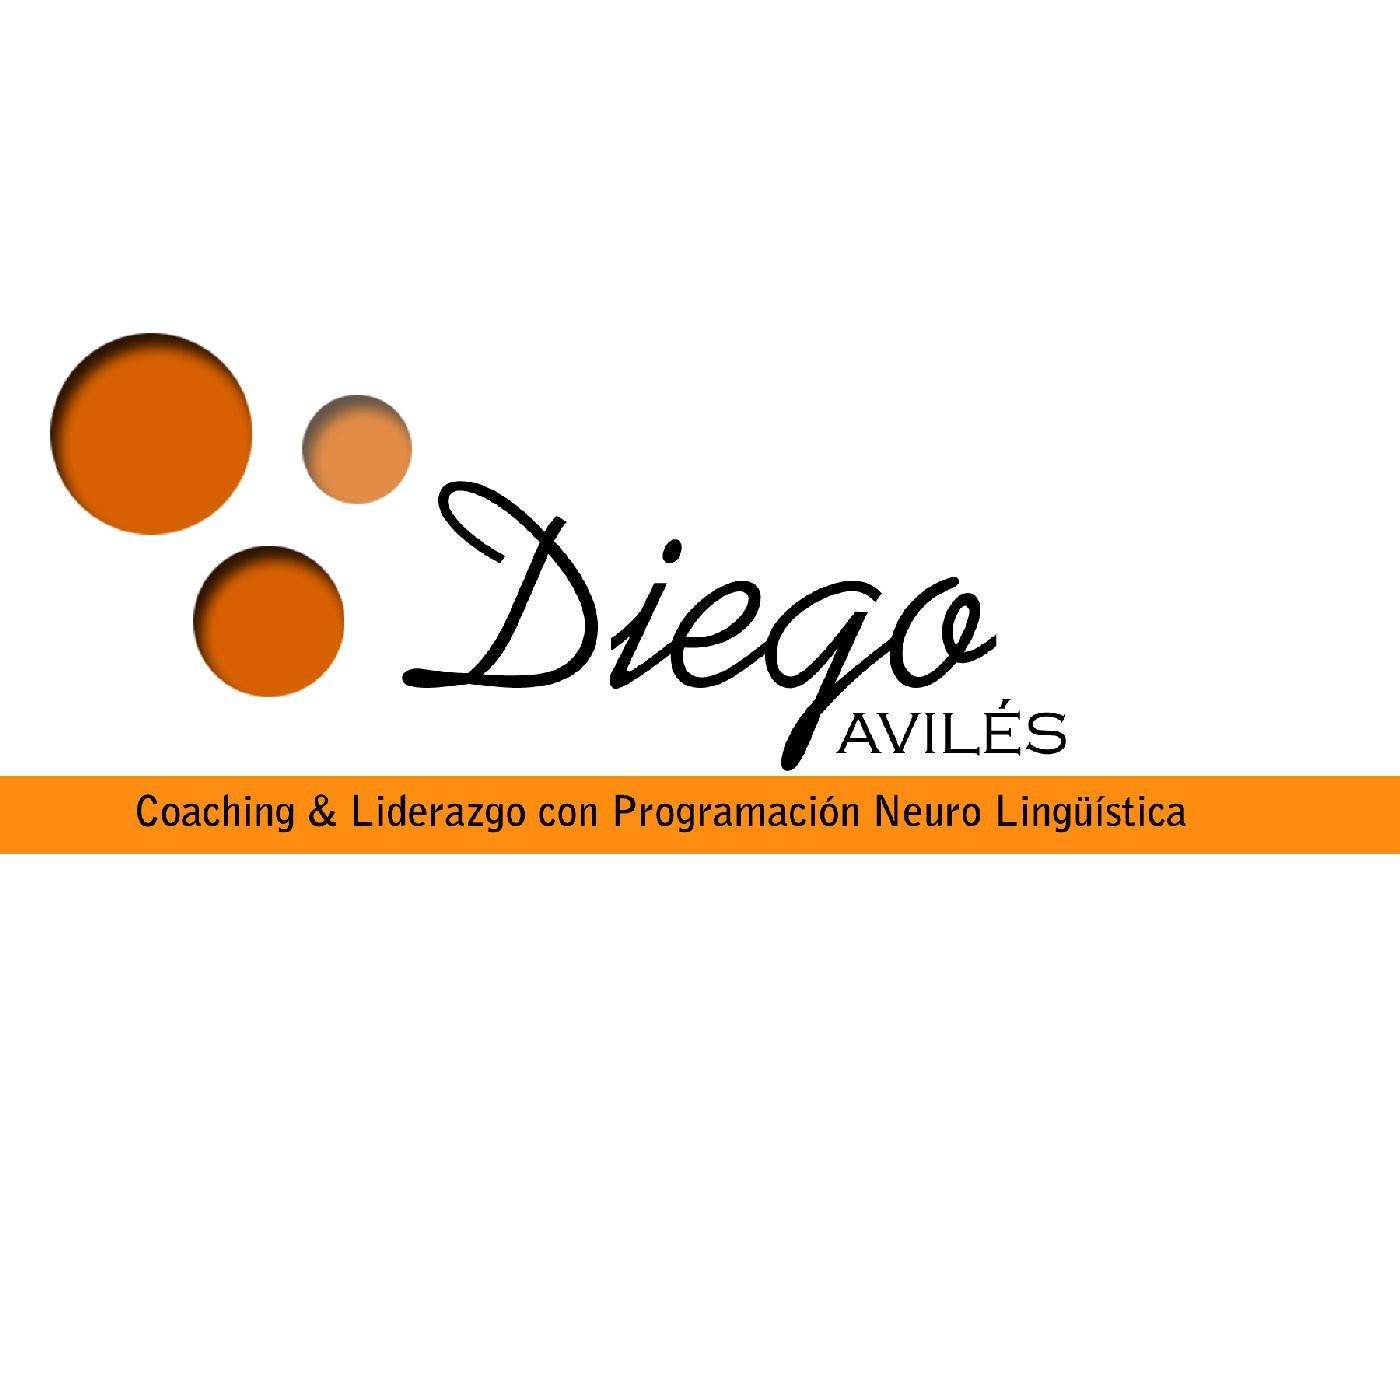 <![CDATA[Podcast de Coach Diego Avilés I Coaching & PNL]]>